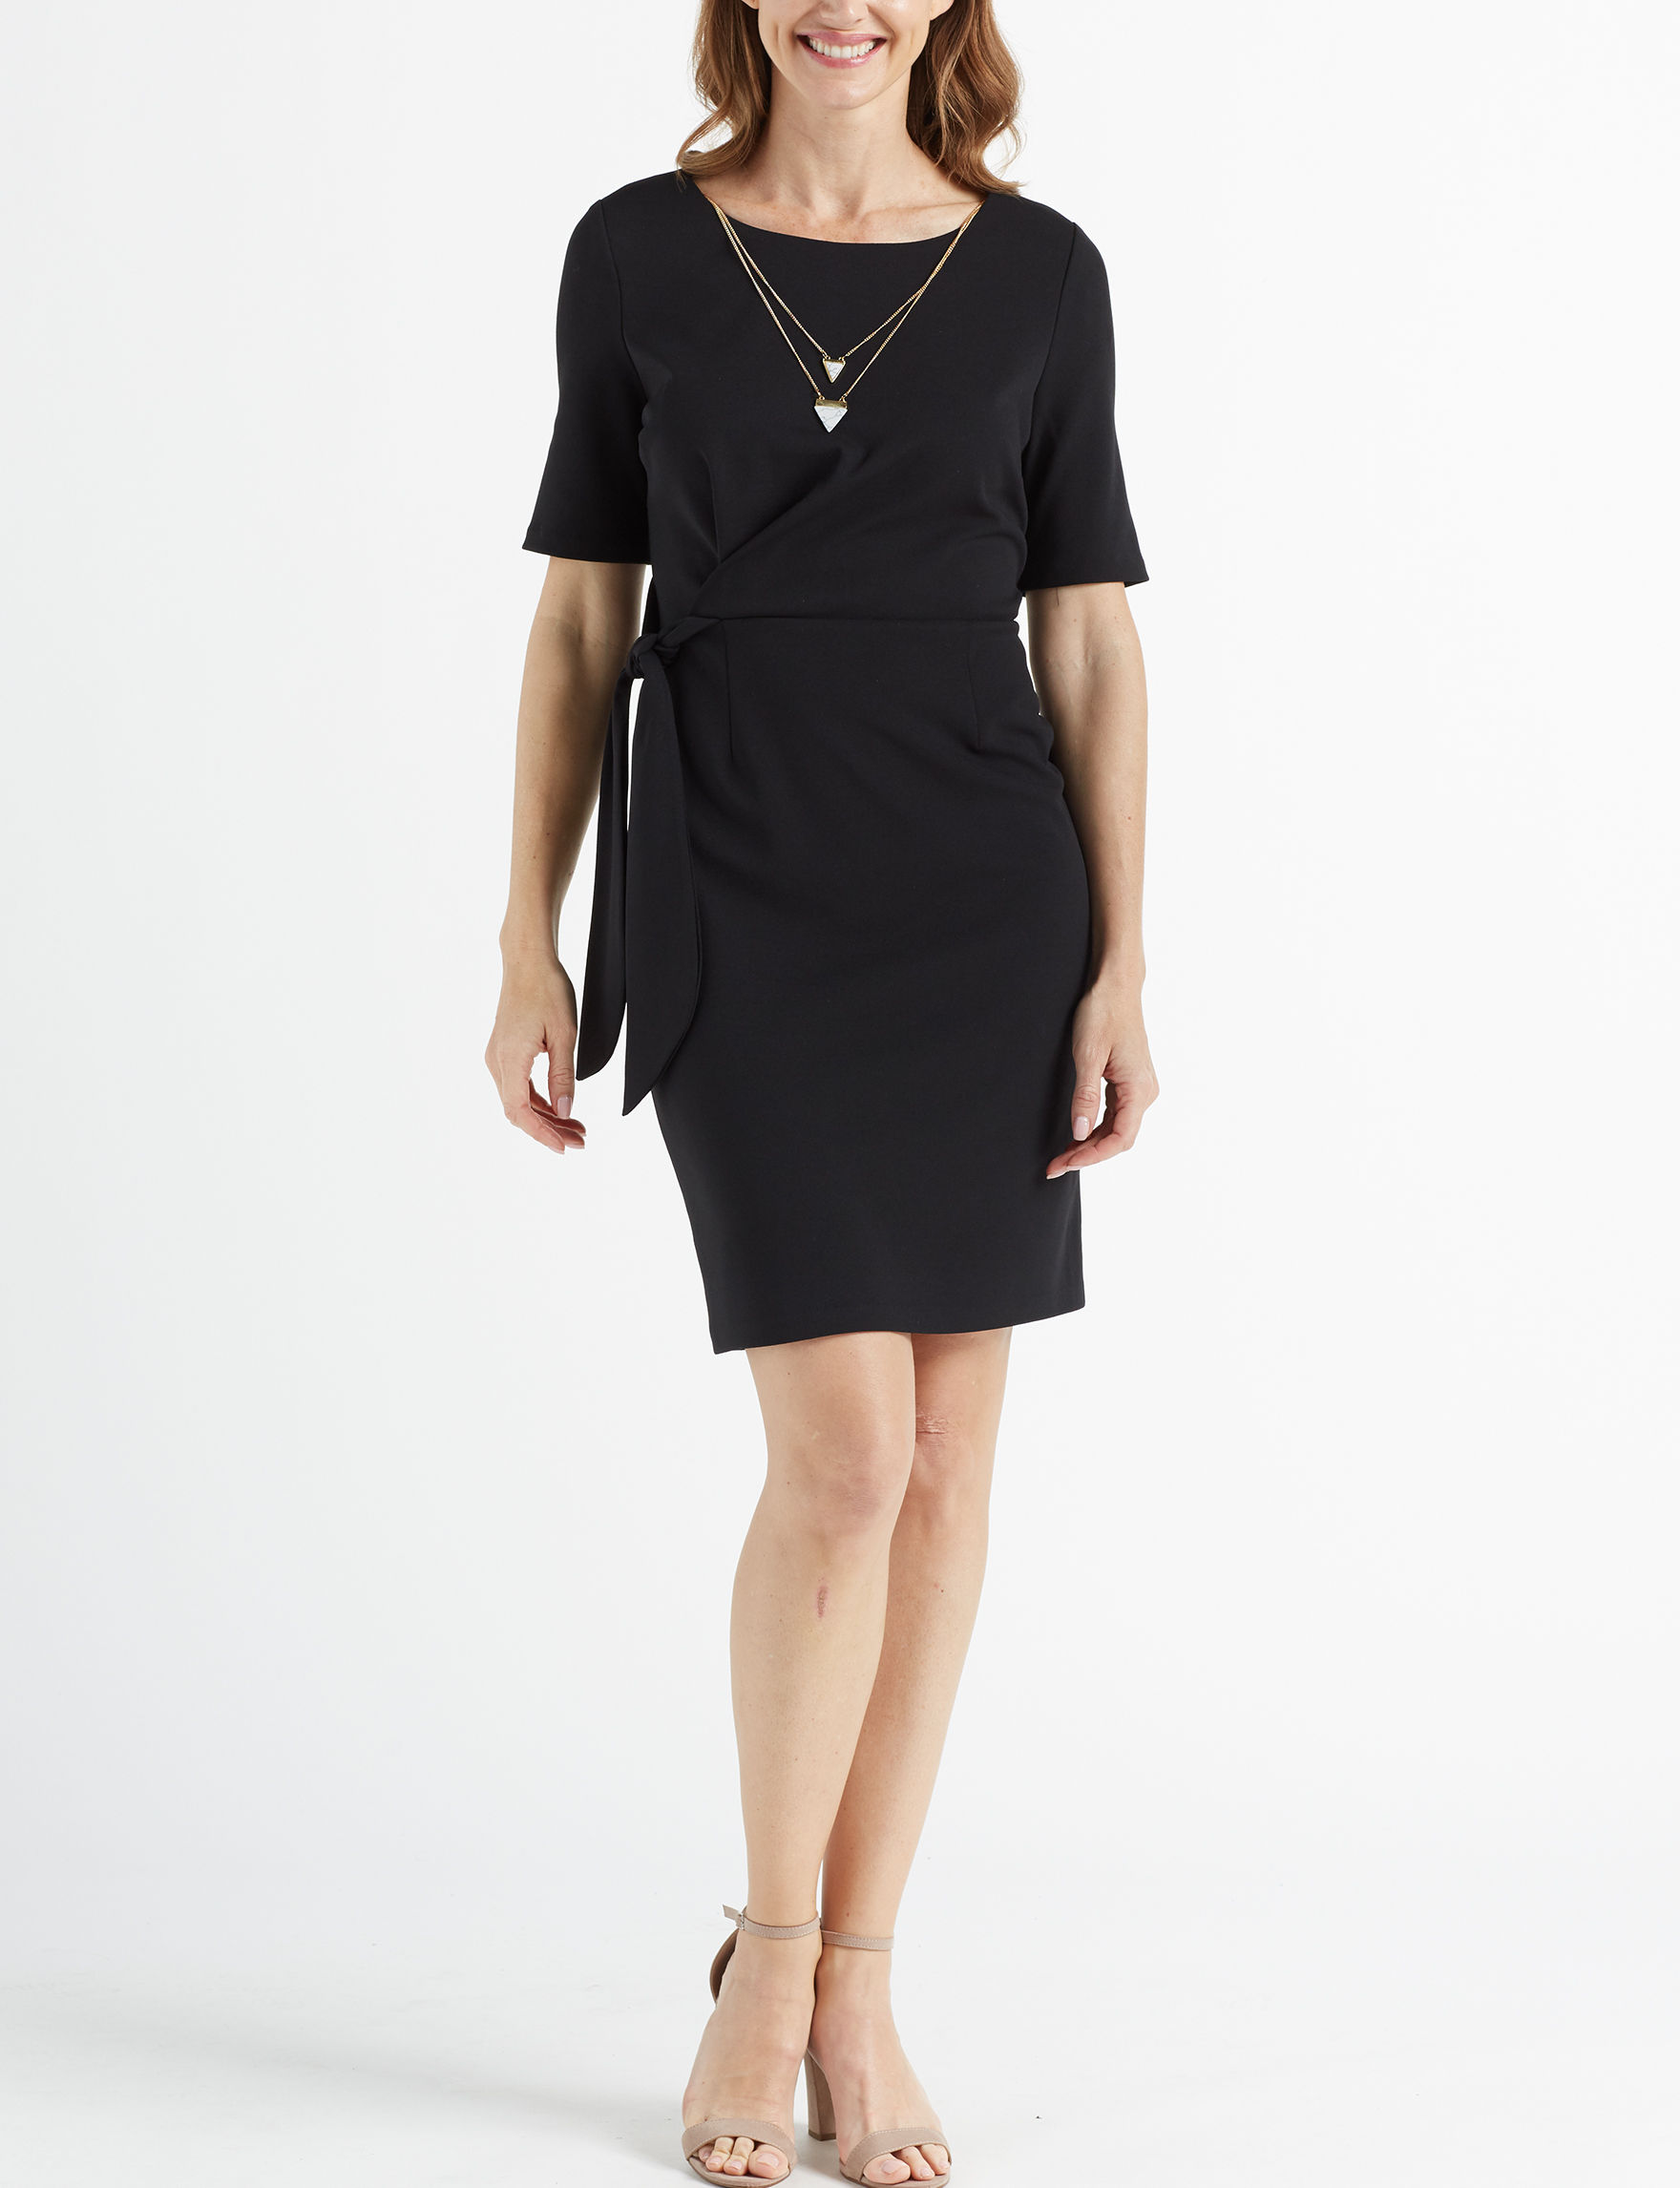 Glamour Black Everyday & Casual Sheath Dresses